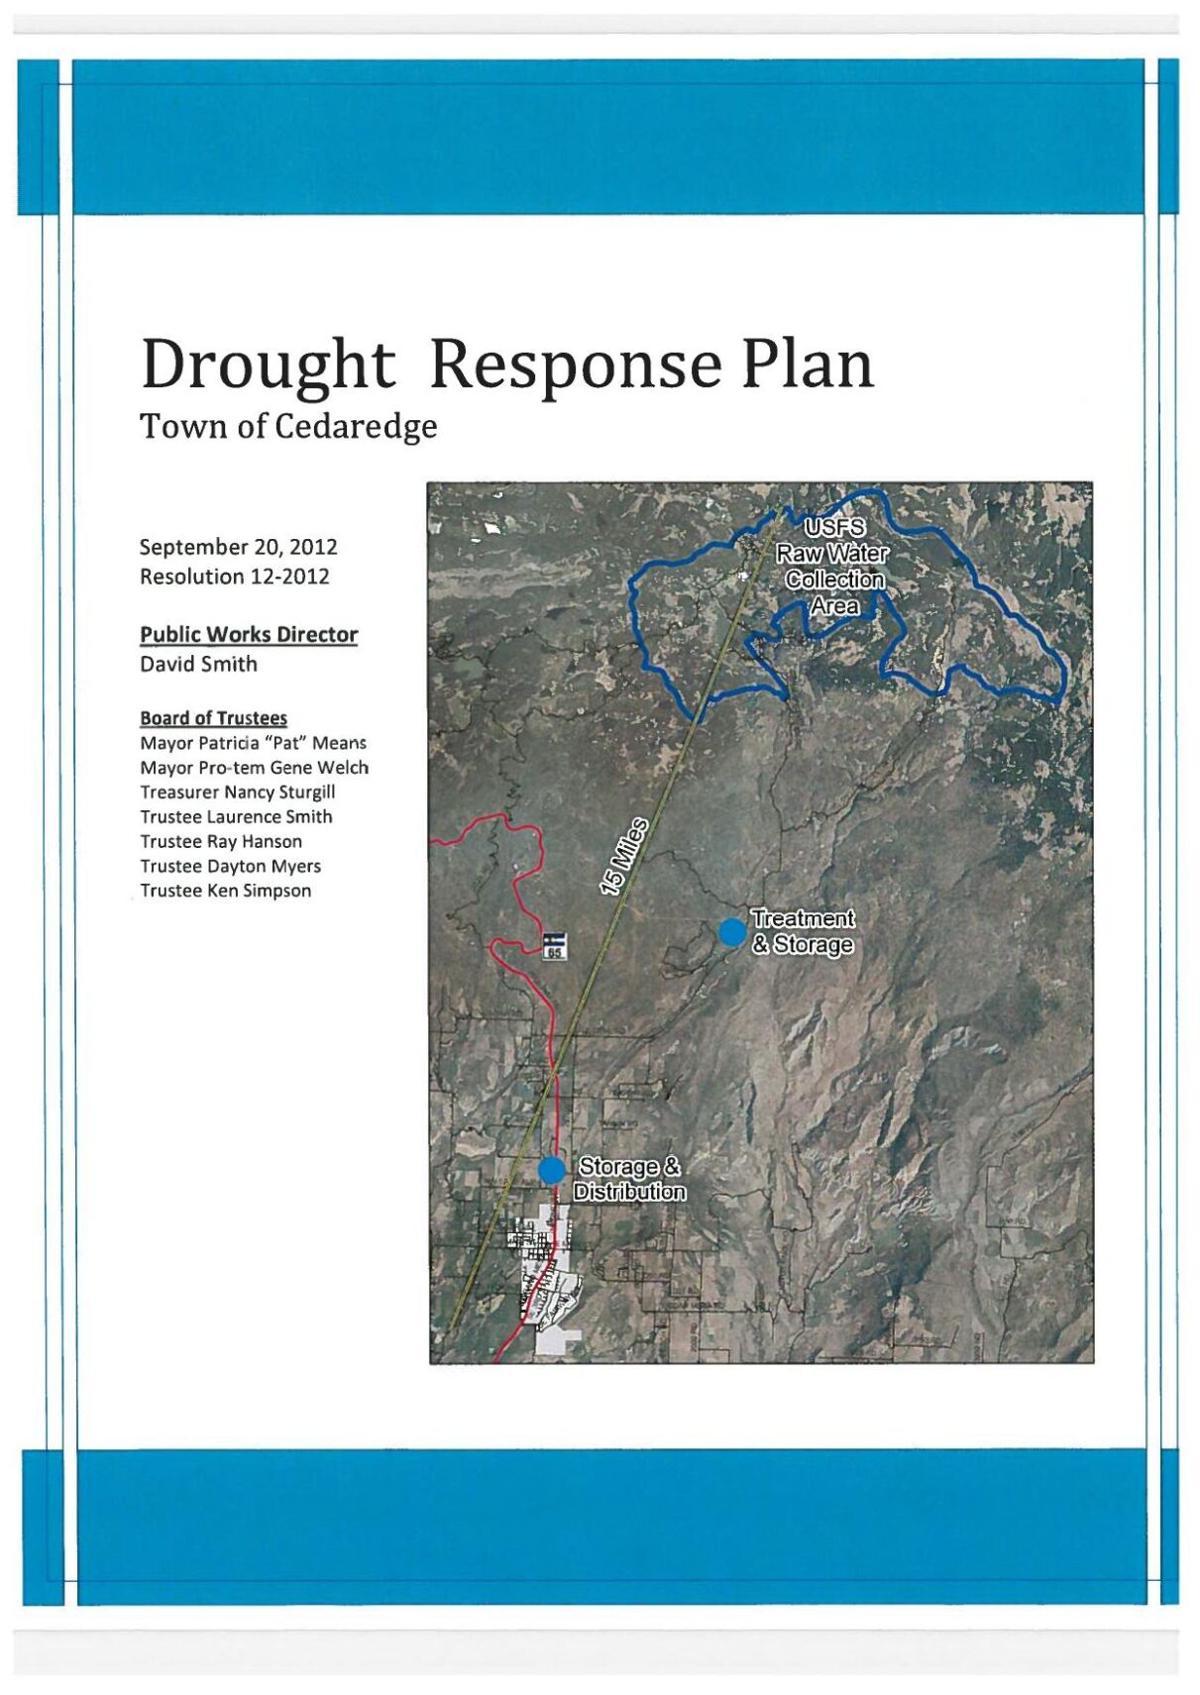 Drought Response Plan, 2012